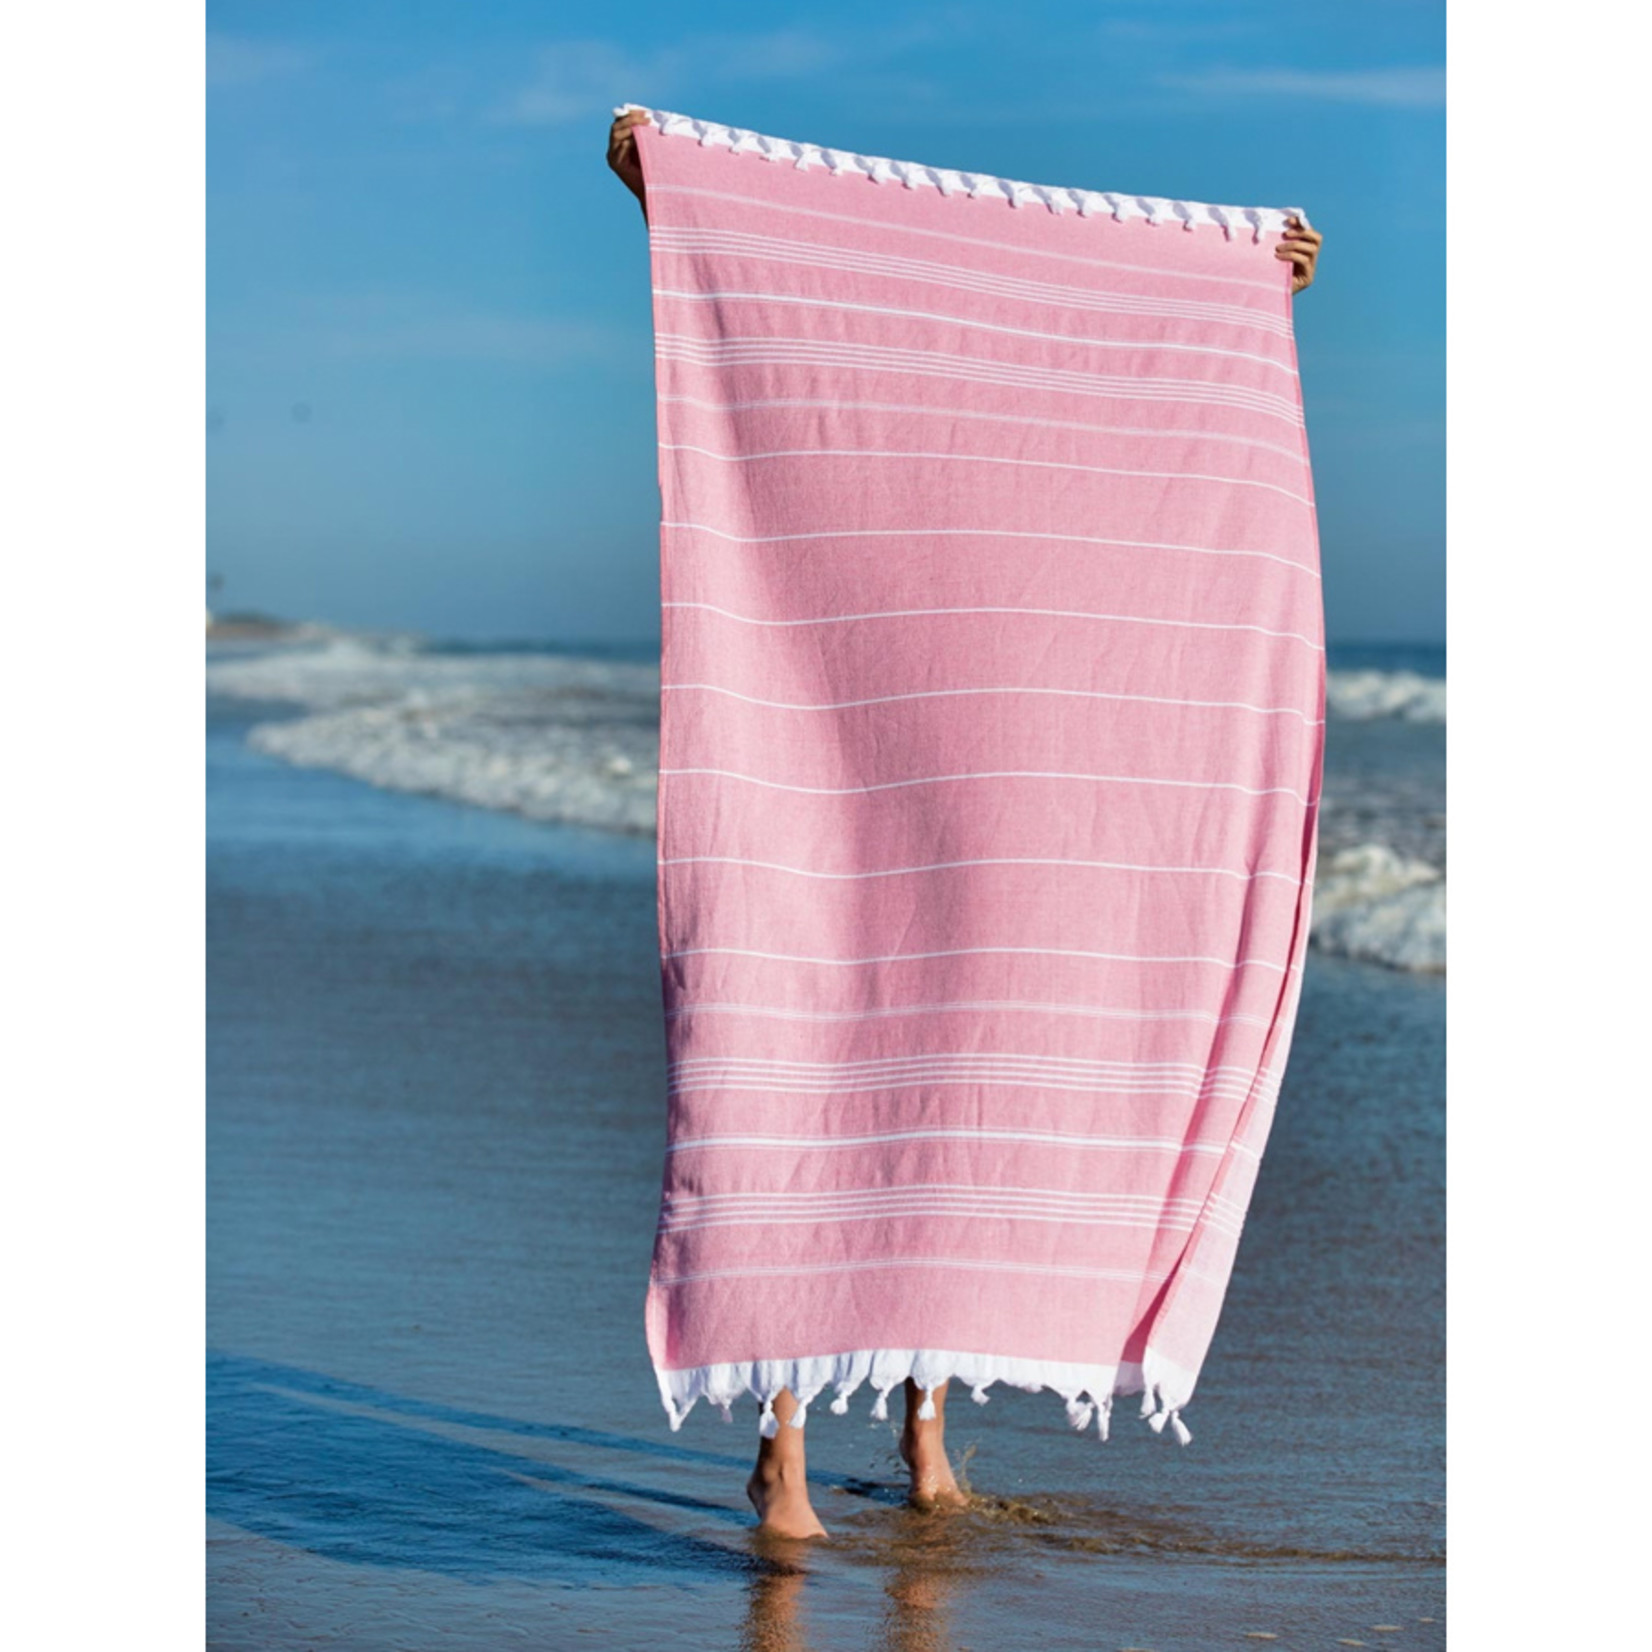 Riviera Towel Company Essential Terry Turkish Towel